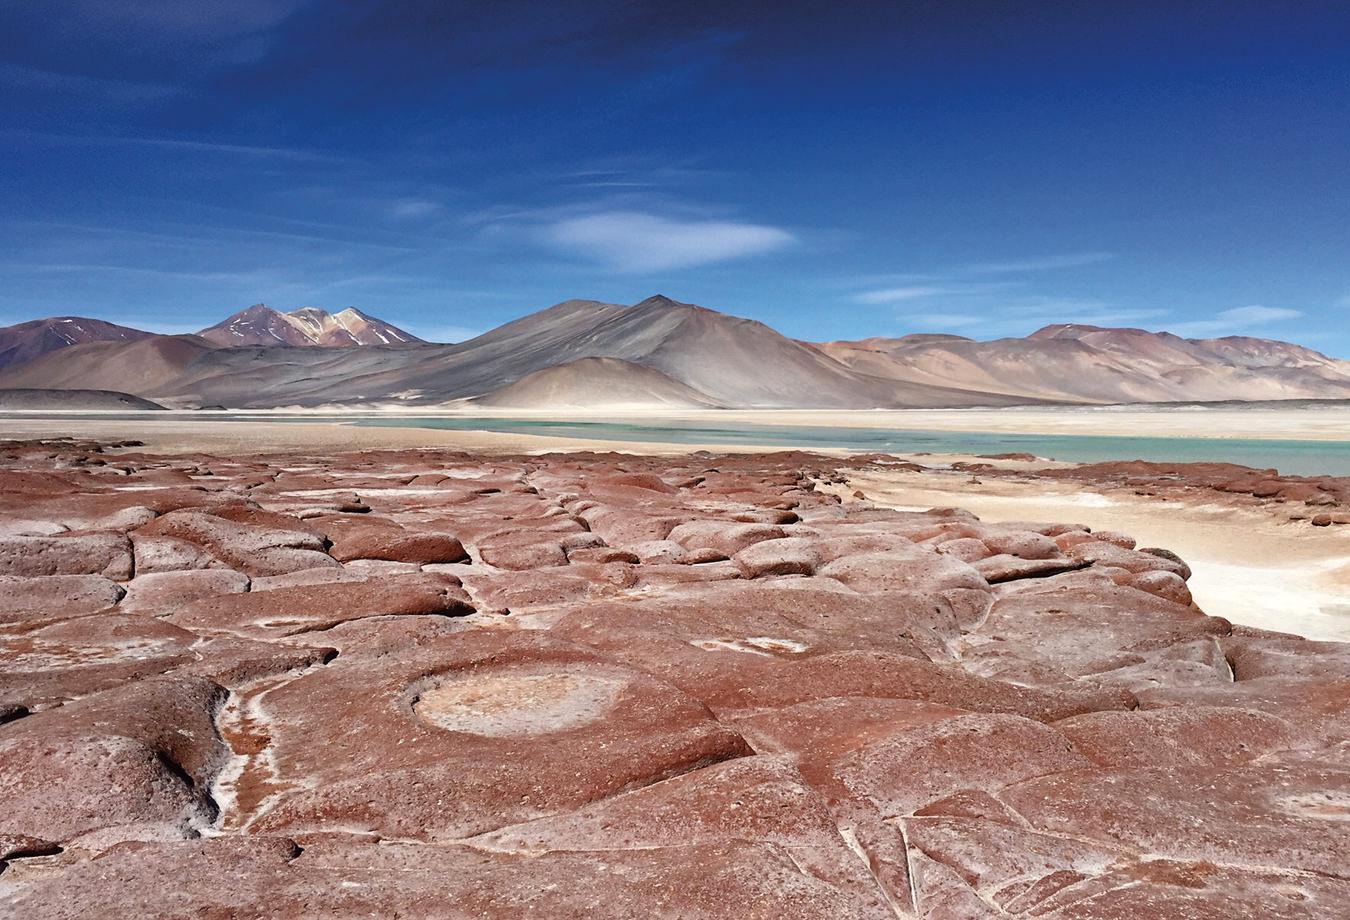 Patagonia and Atacama